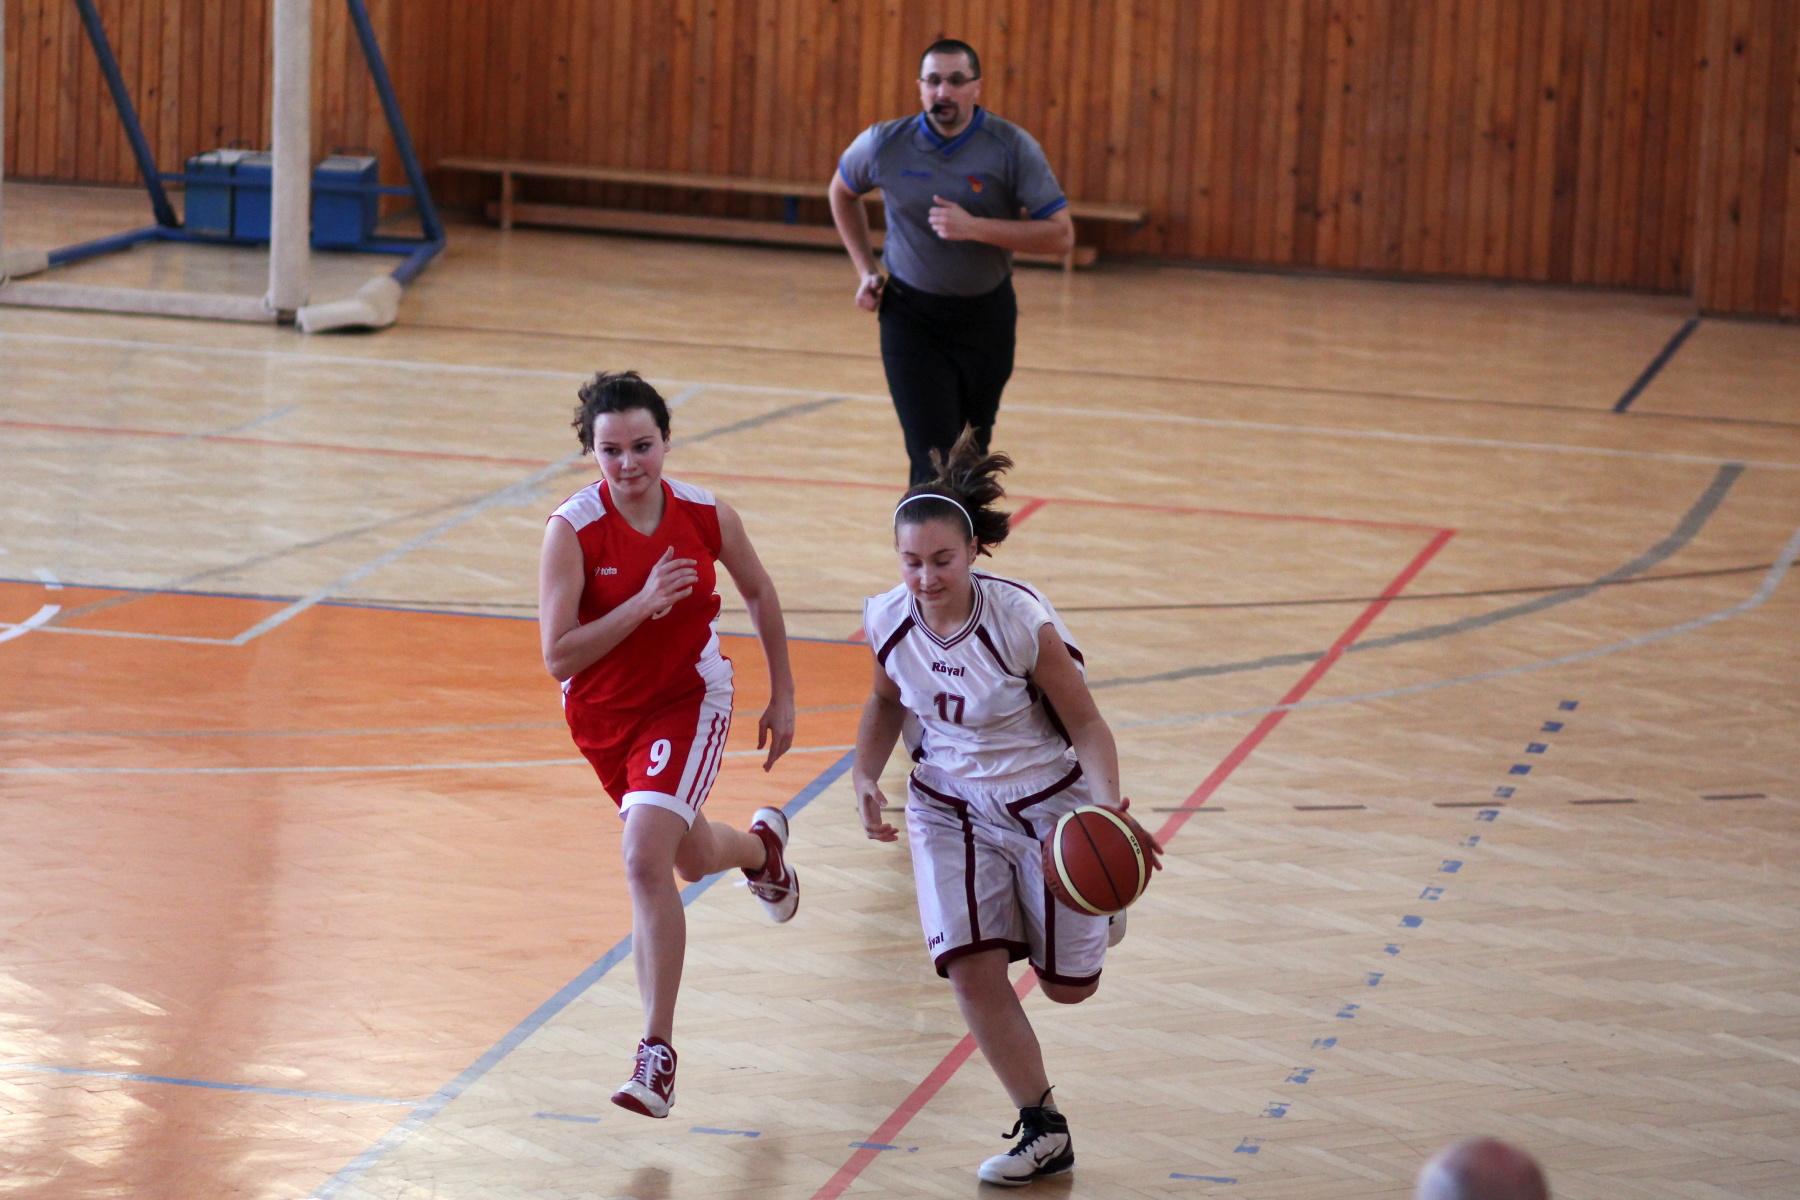 zvolen-bystrica-ziacky-basketbal-18